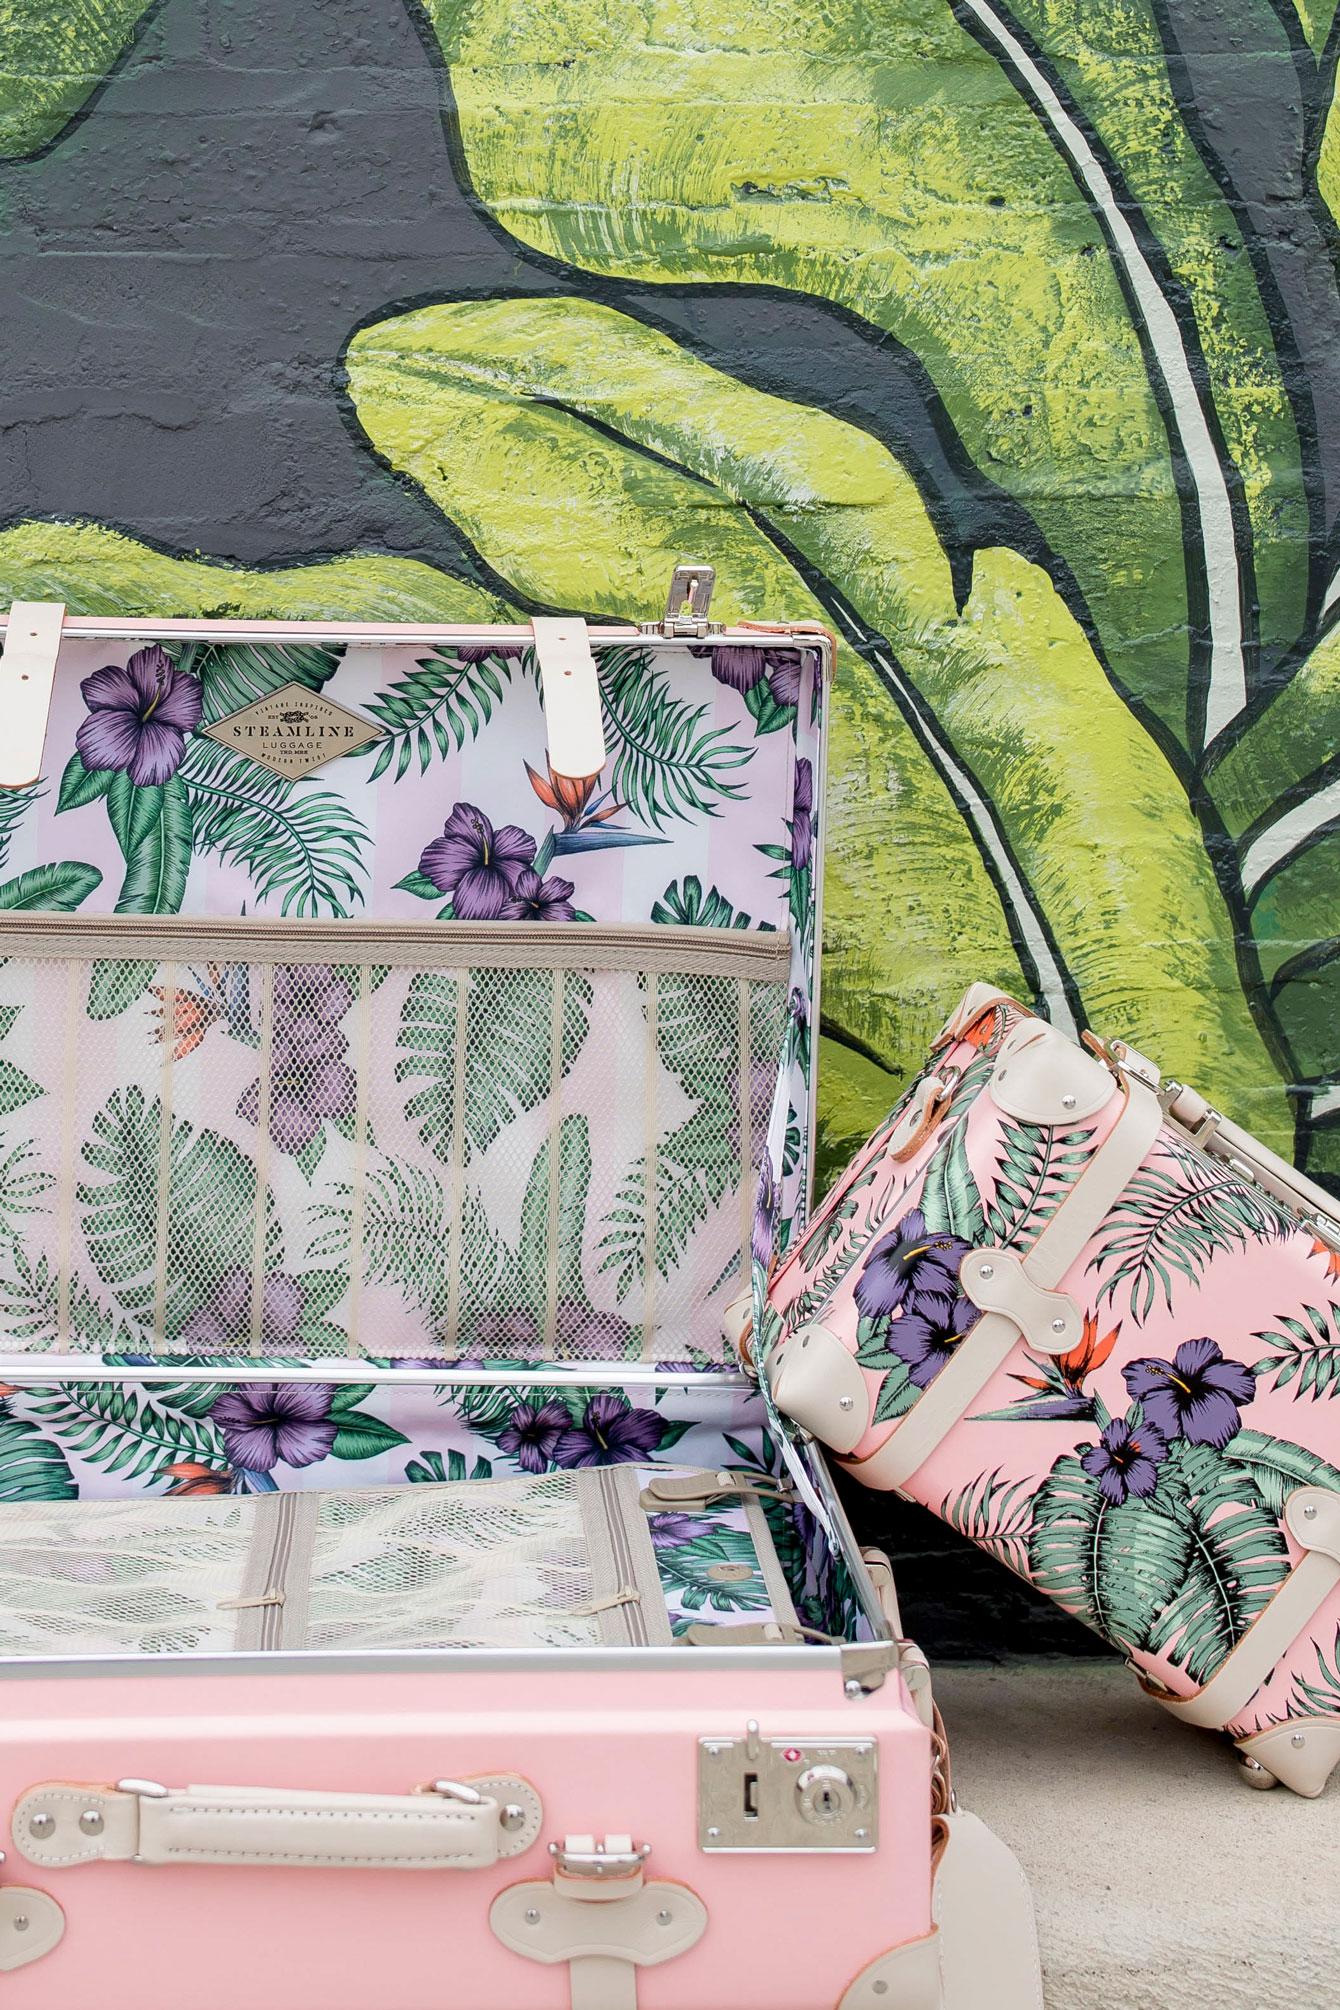 SteamLine Tropical Print Pink Luggage